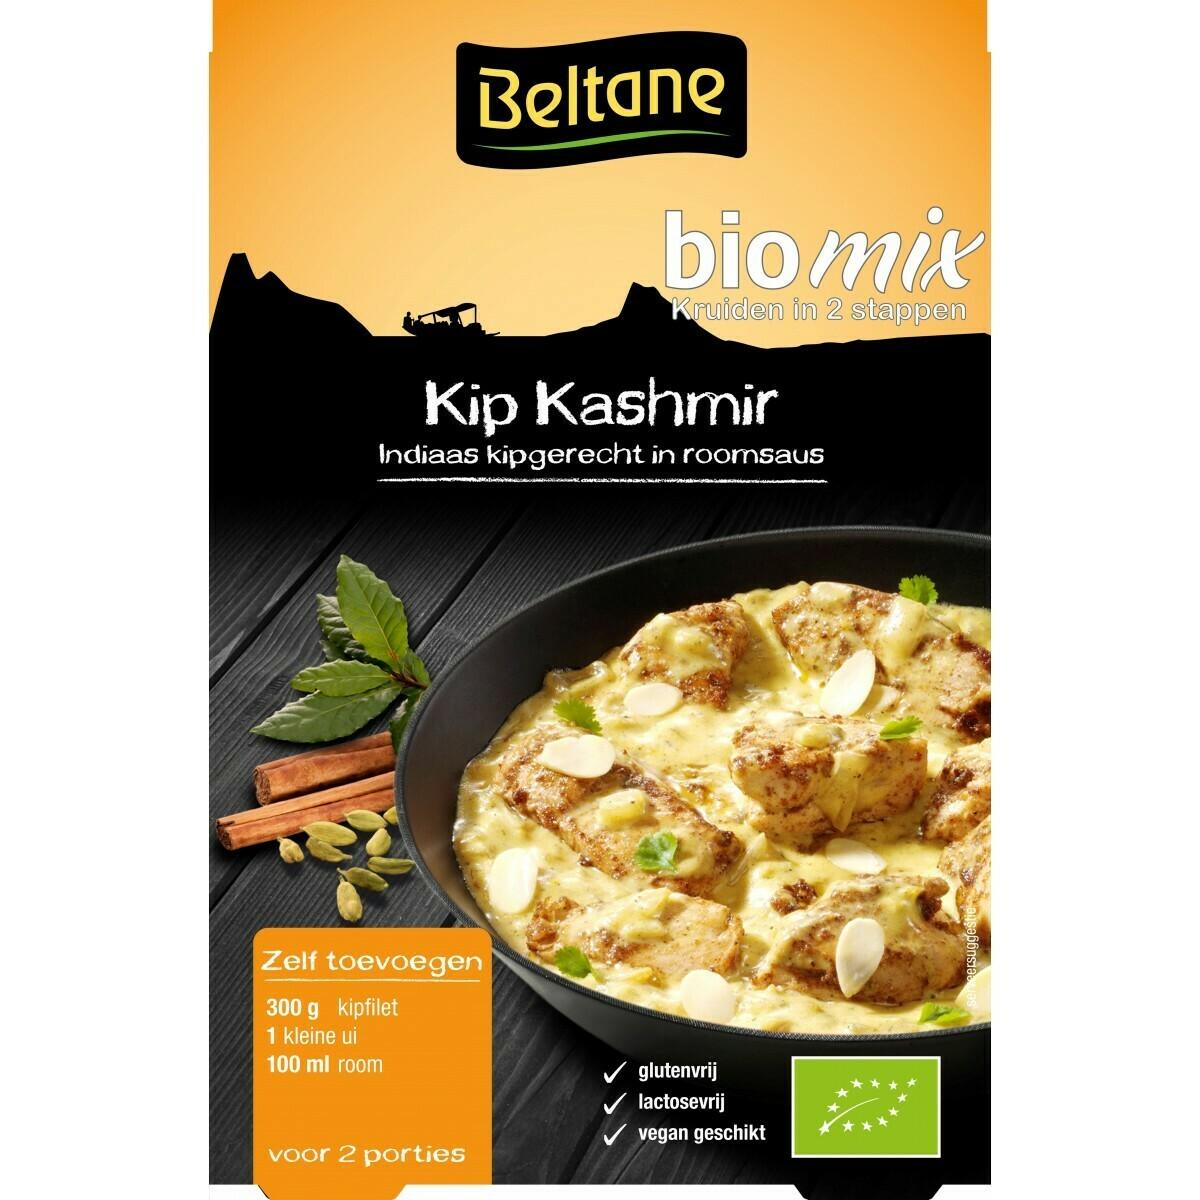 Beltane Kip Kashmir